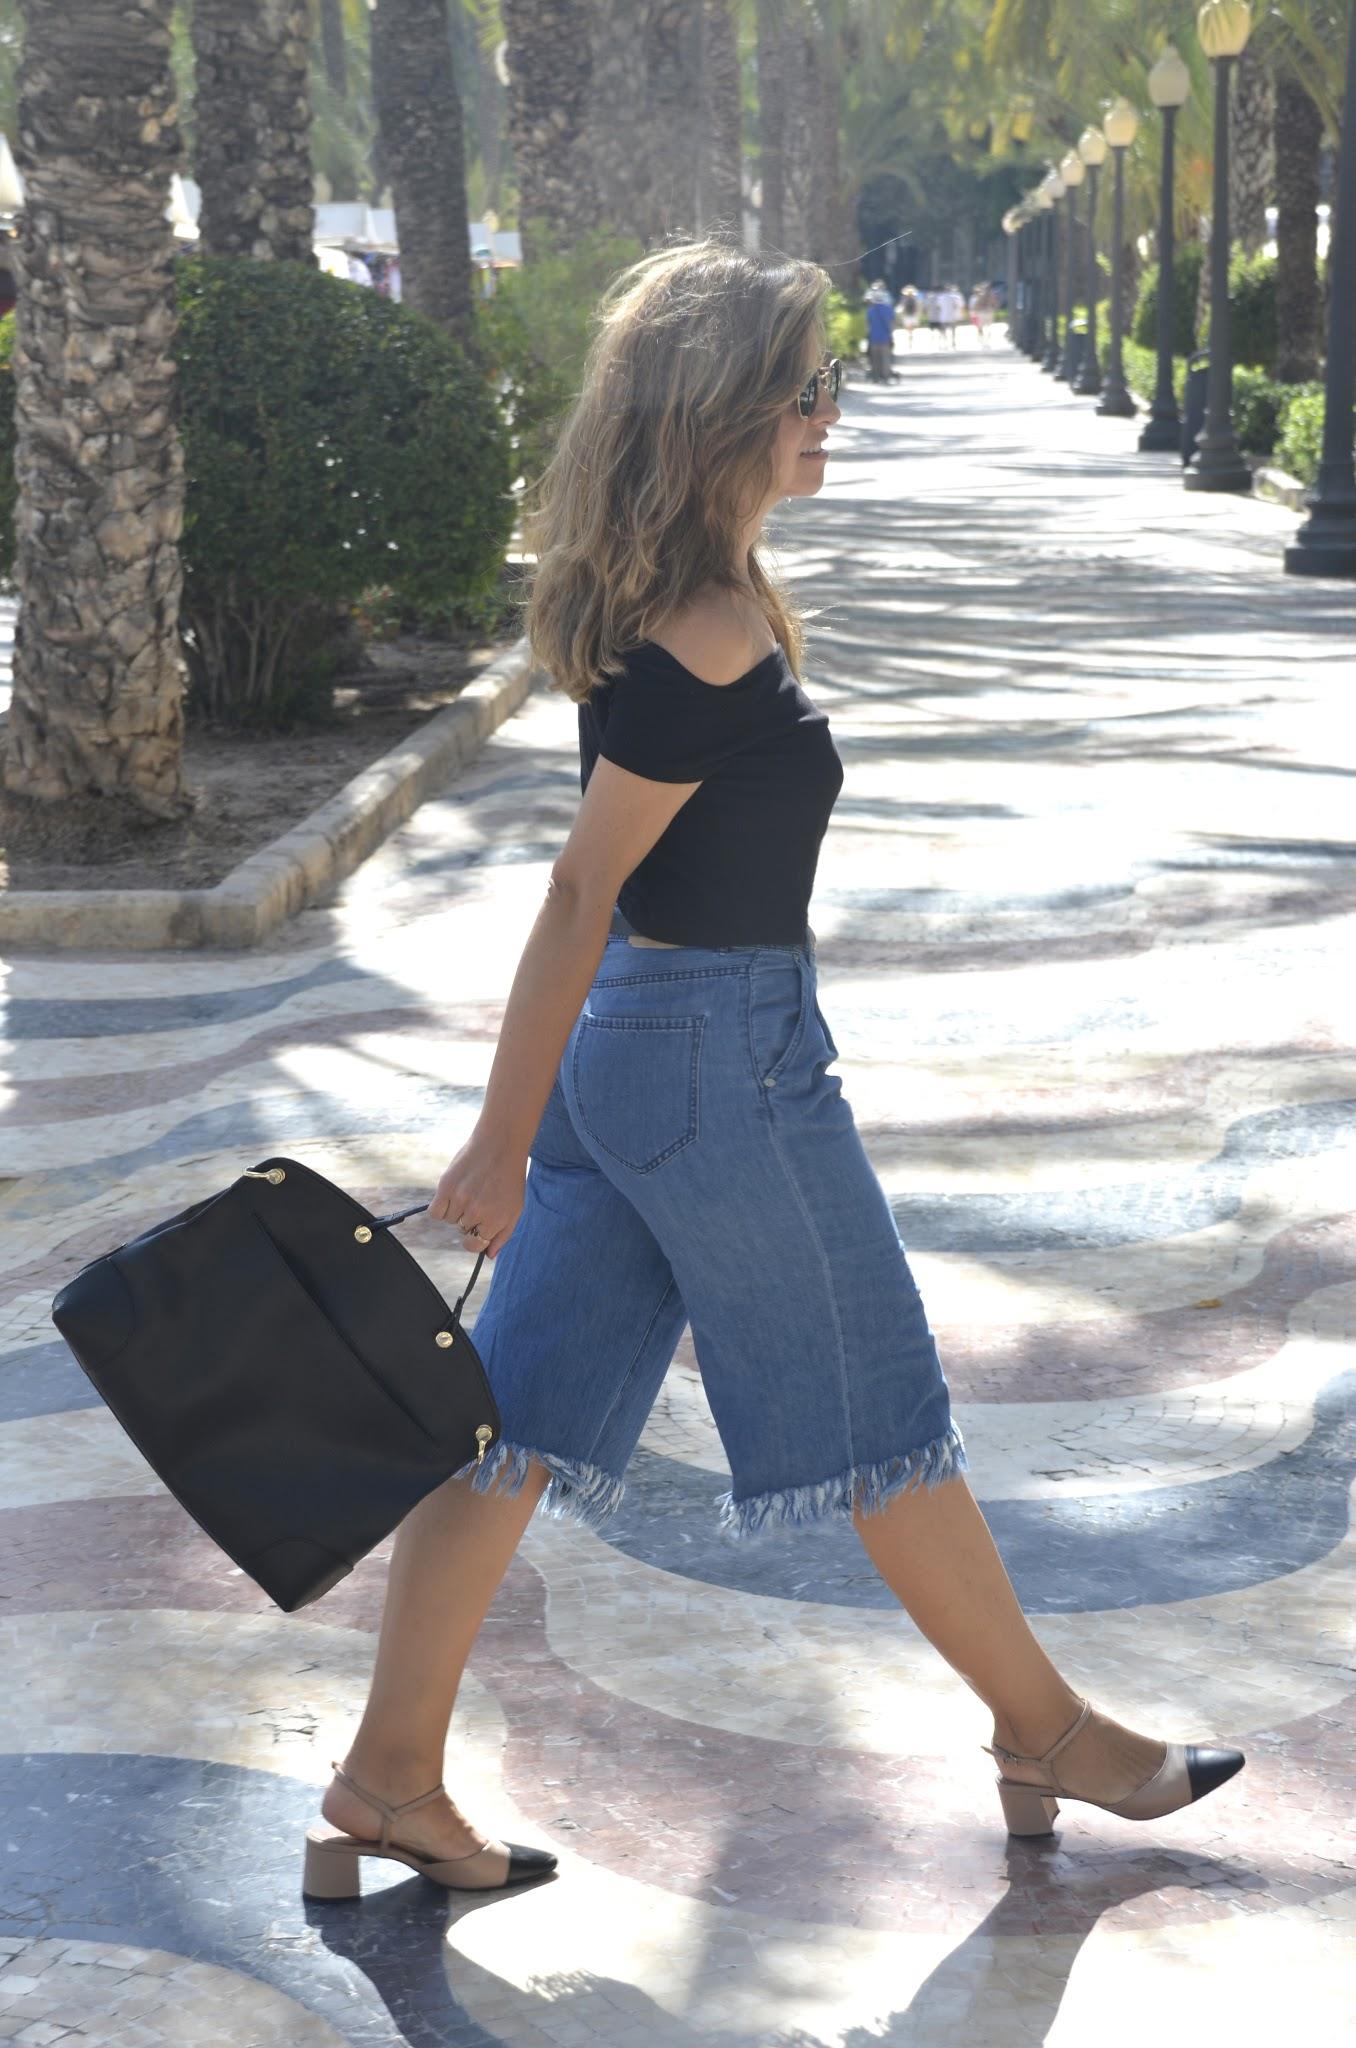 tendencia zapatos bicolor clon slingback chanel